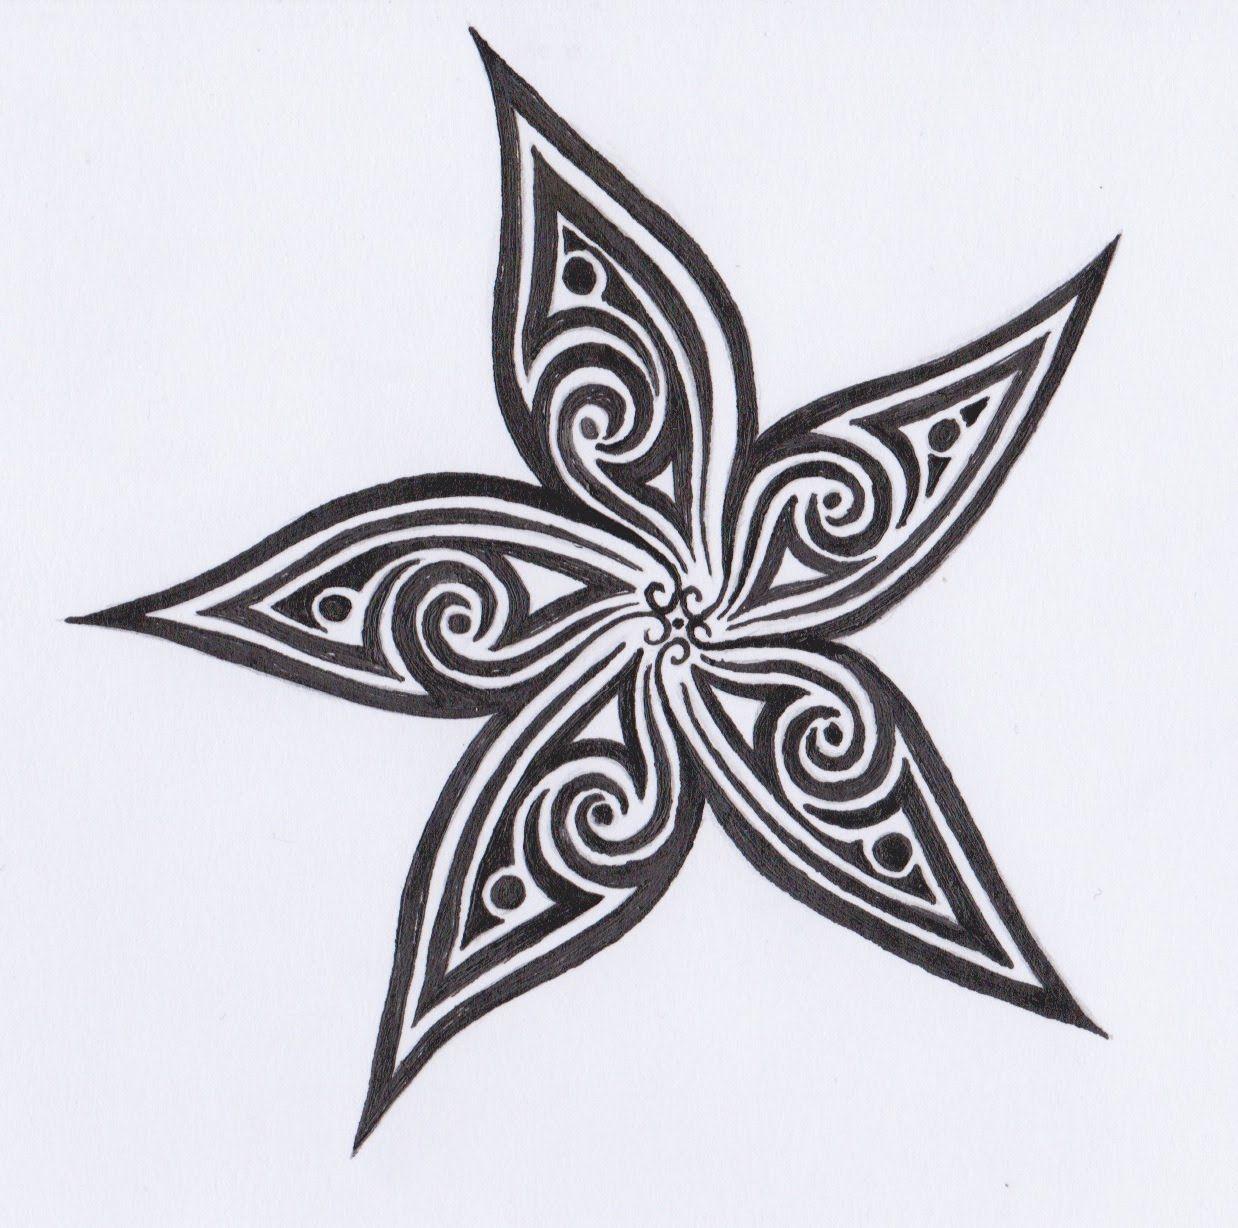 Dessin Tribal Fleur dessin encre - fleur tribal (tribal flower) | recettes à cuisiner